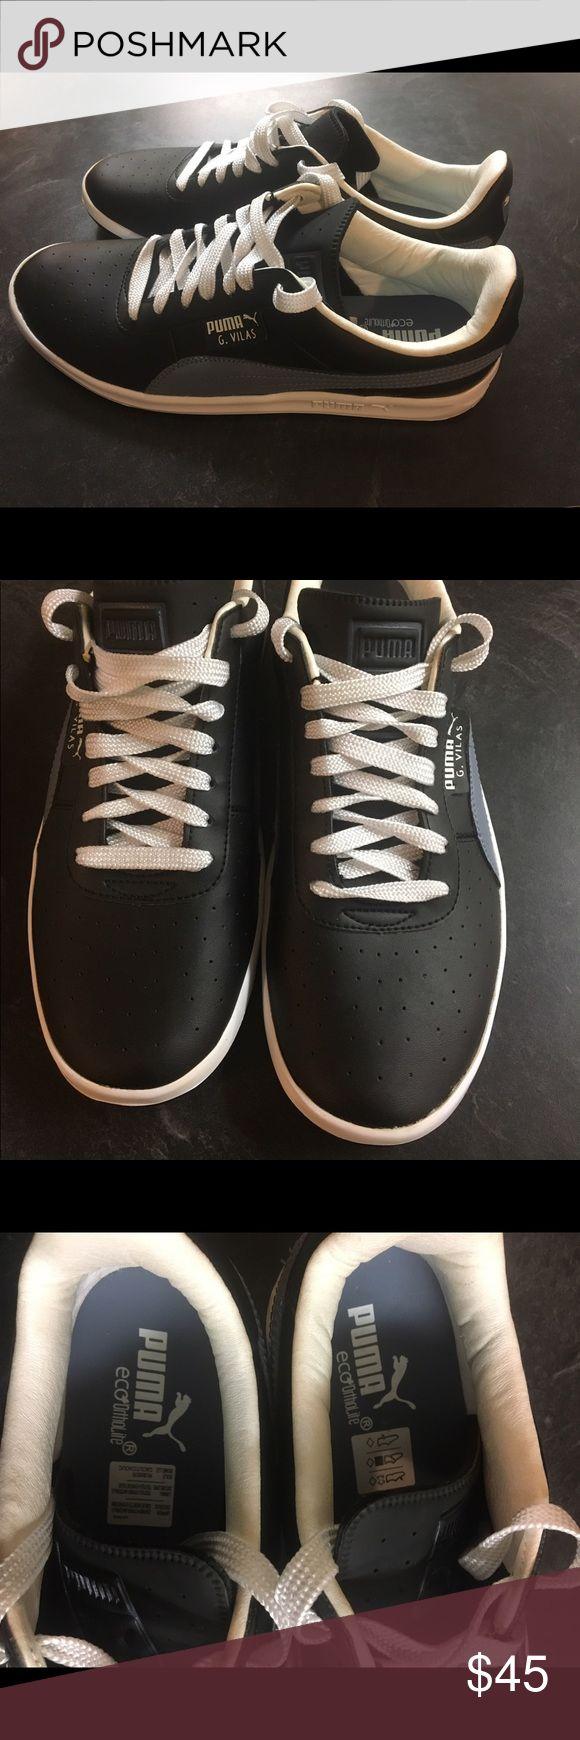 Puma G vilas Black flint Stone. Classic retro Beautiful classic Puma vilas. Pre-loved but very well kept. Puma Shoes Athletic Shoes